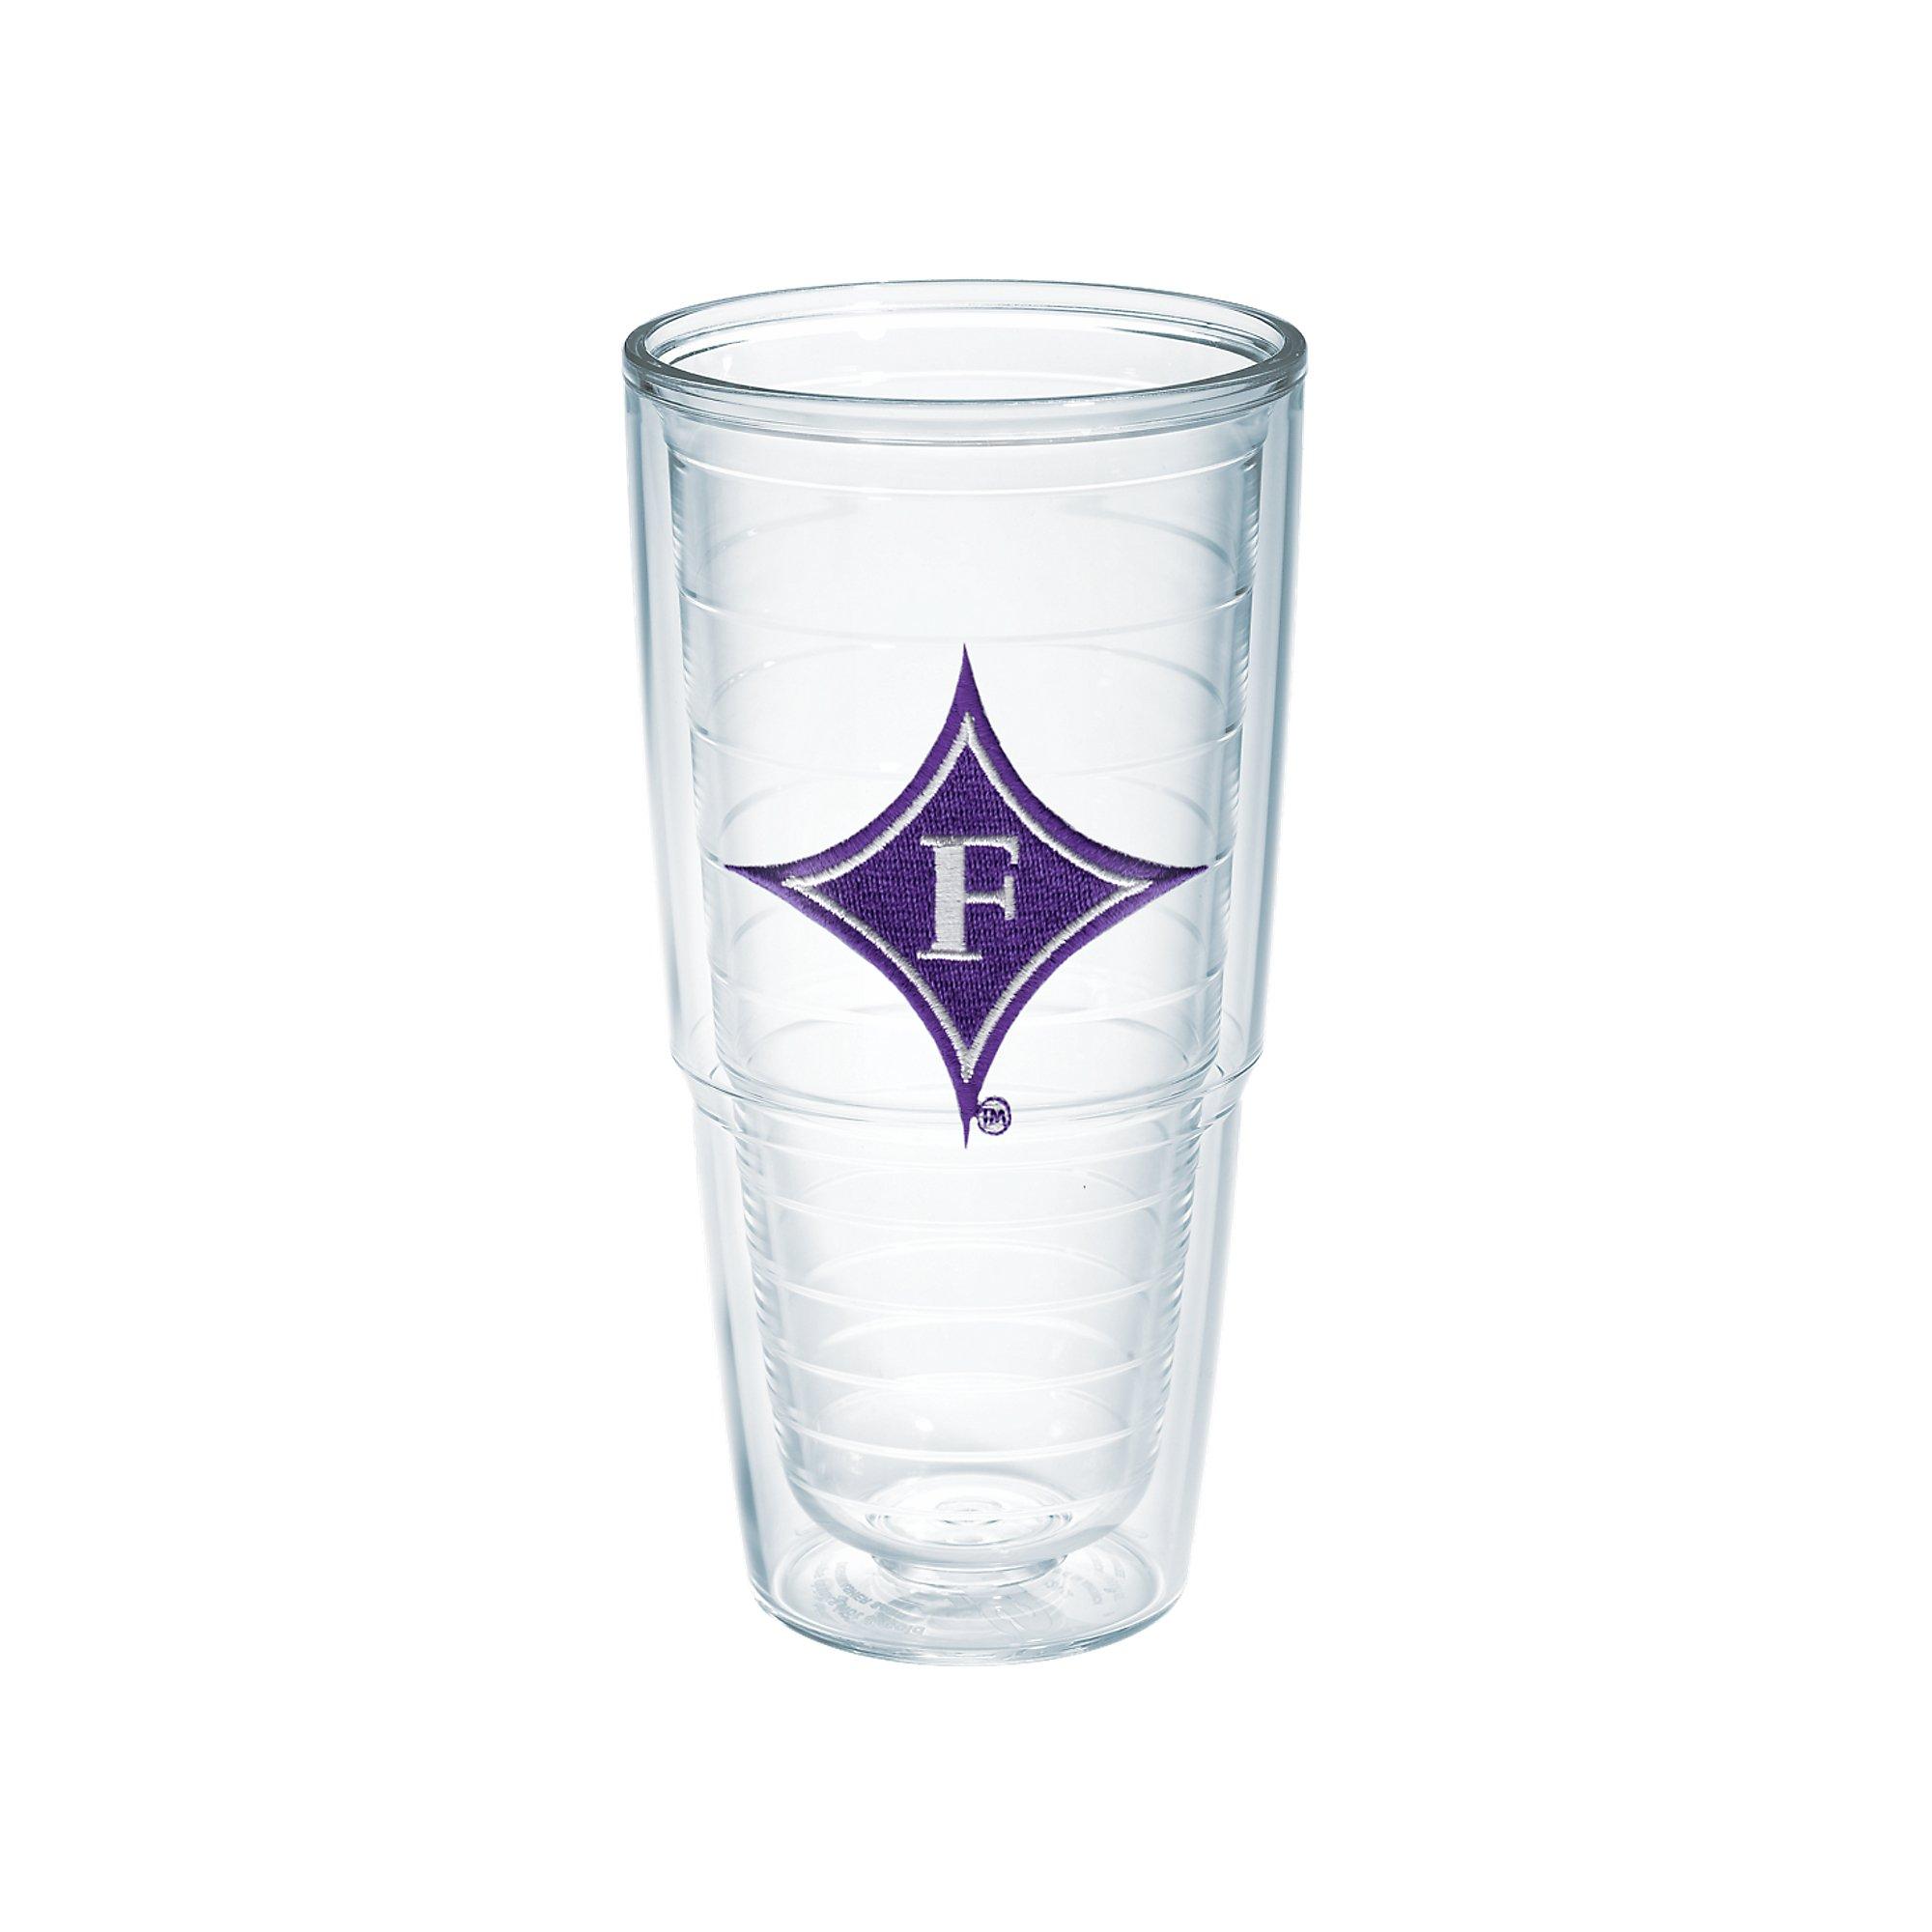 Tervis 1056571 Furman University Emblem Individual Tumbler, 24 oz, Clear